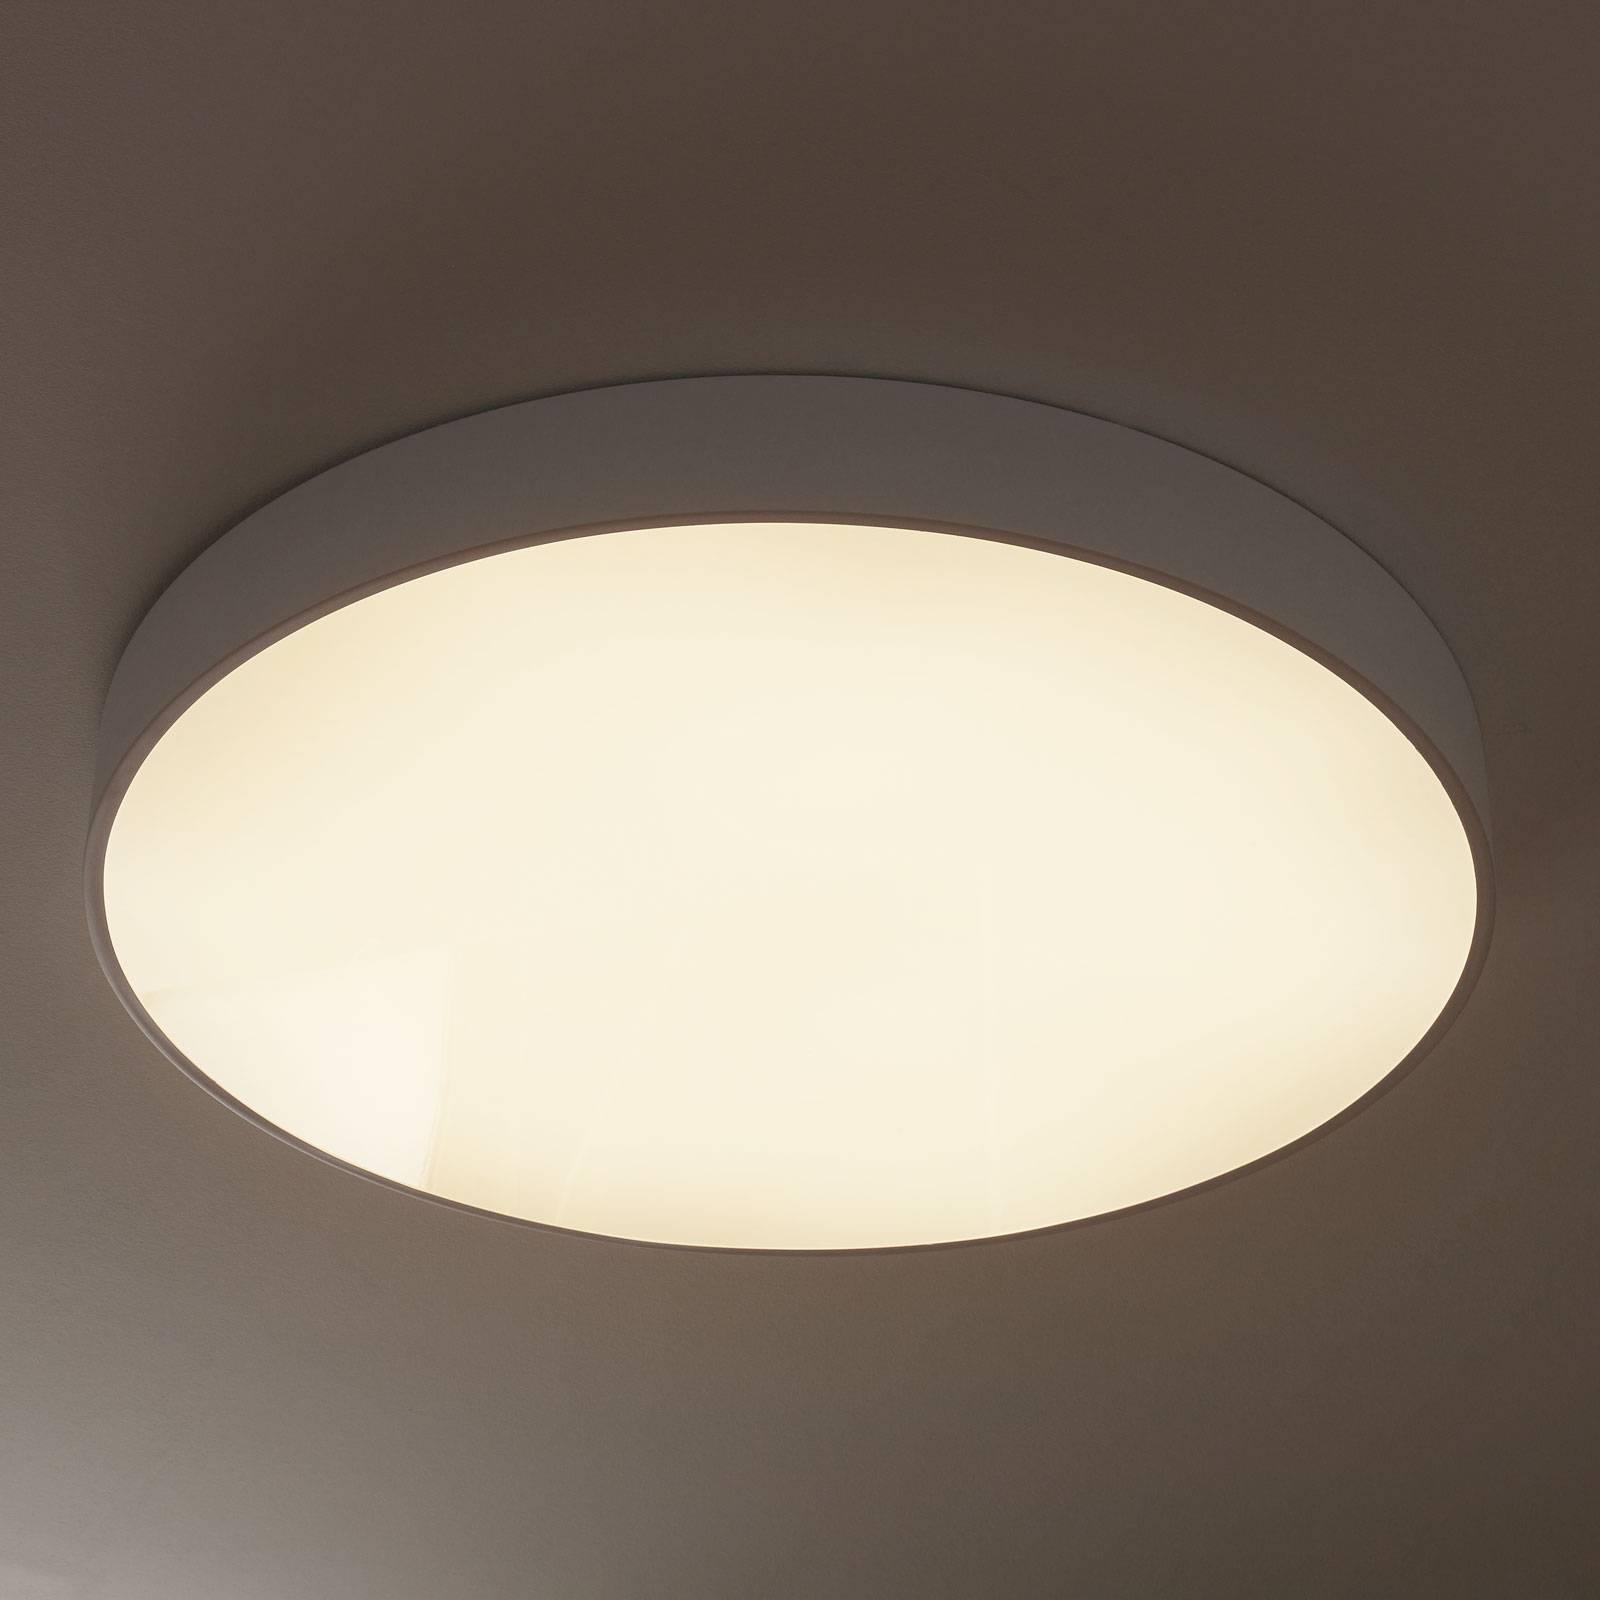 Isia - dimmbare LED-Deckenleuchte, Ø 100 cm